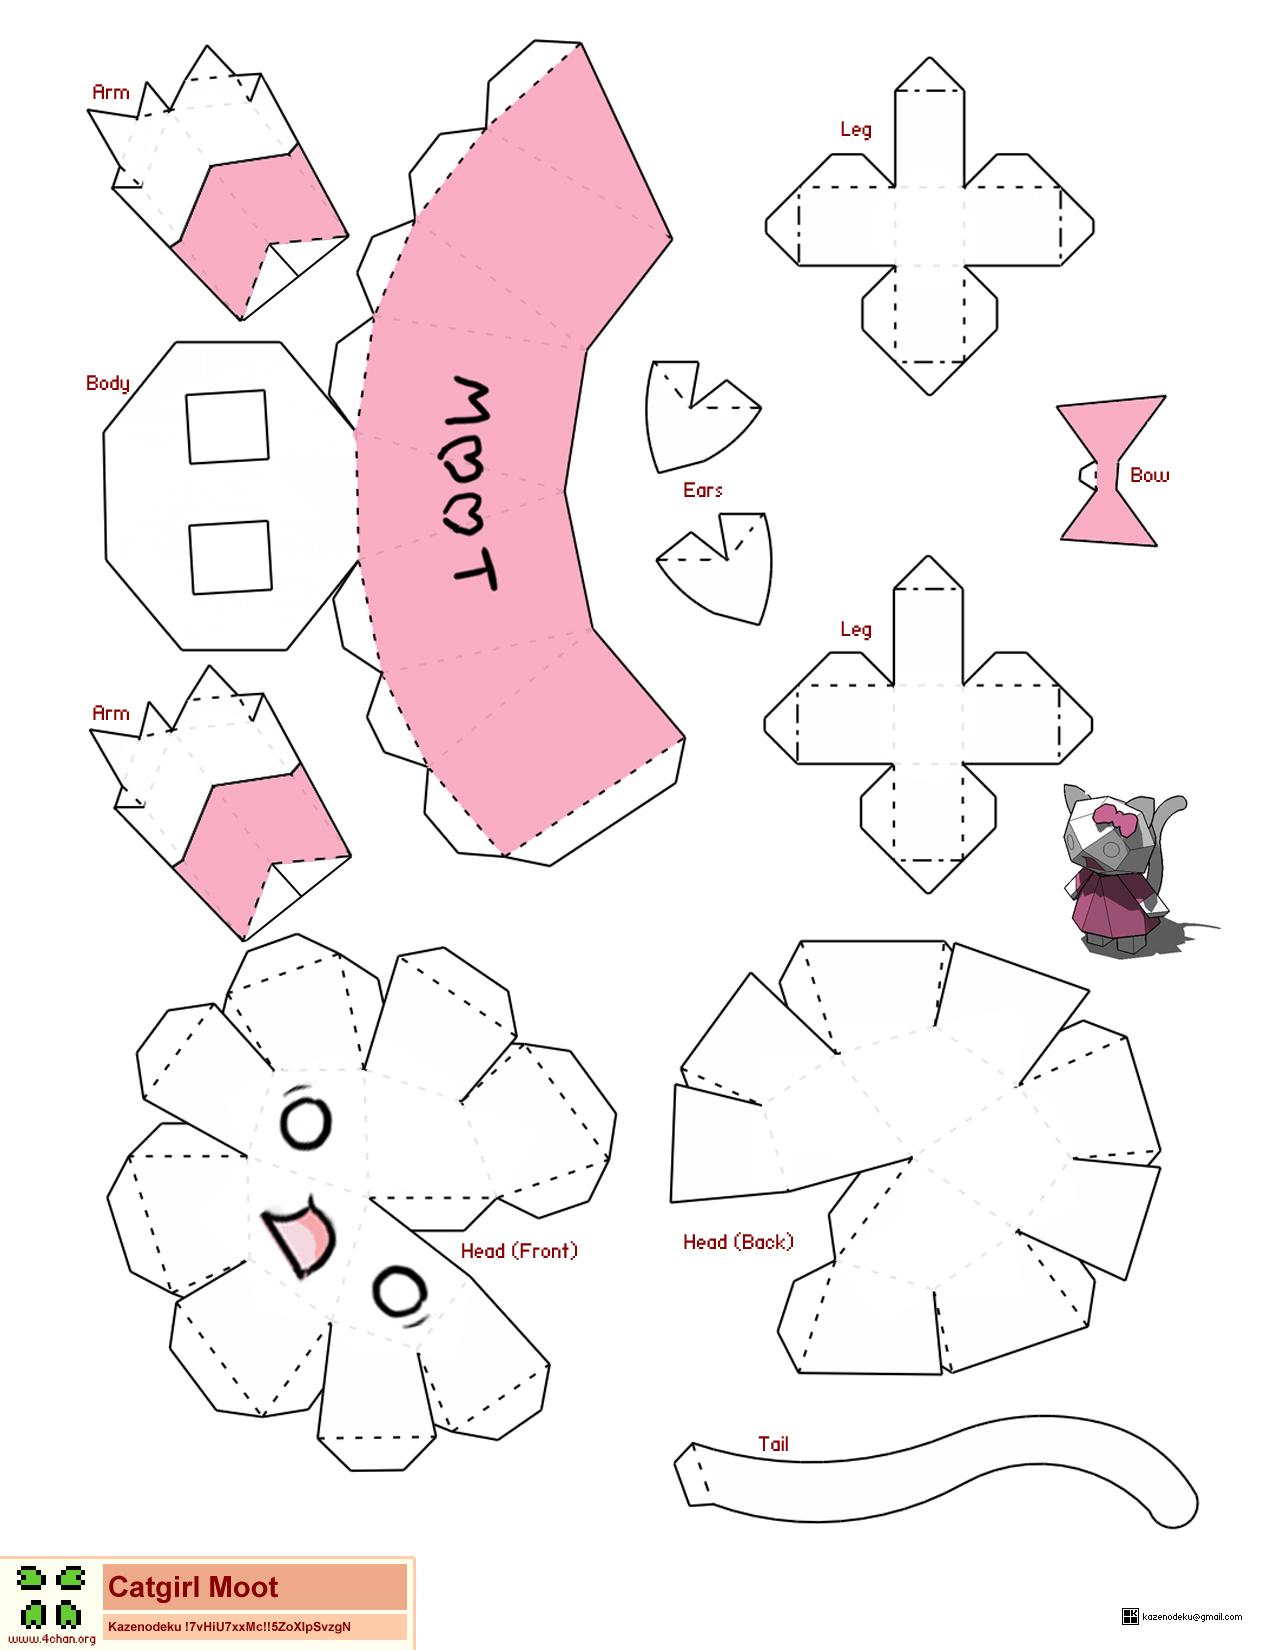 cybergata more on meme paper craft